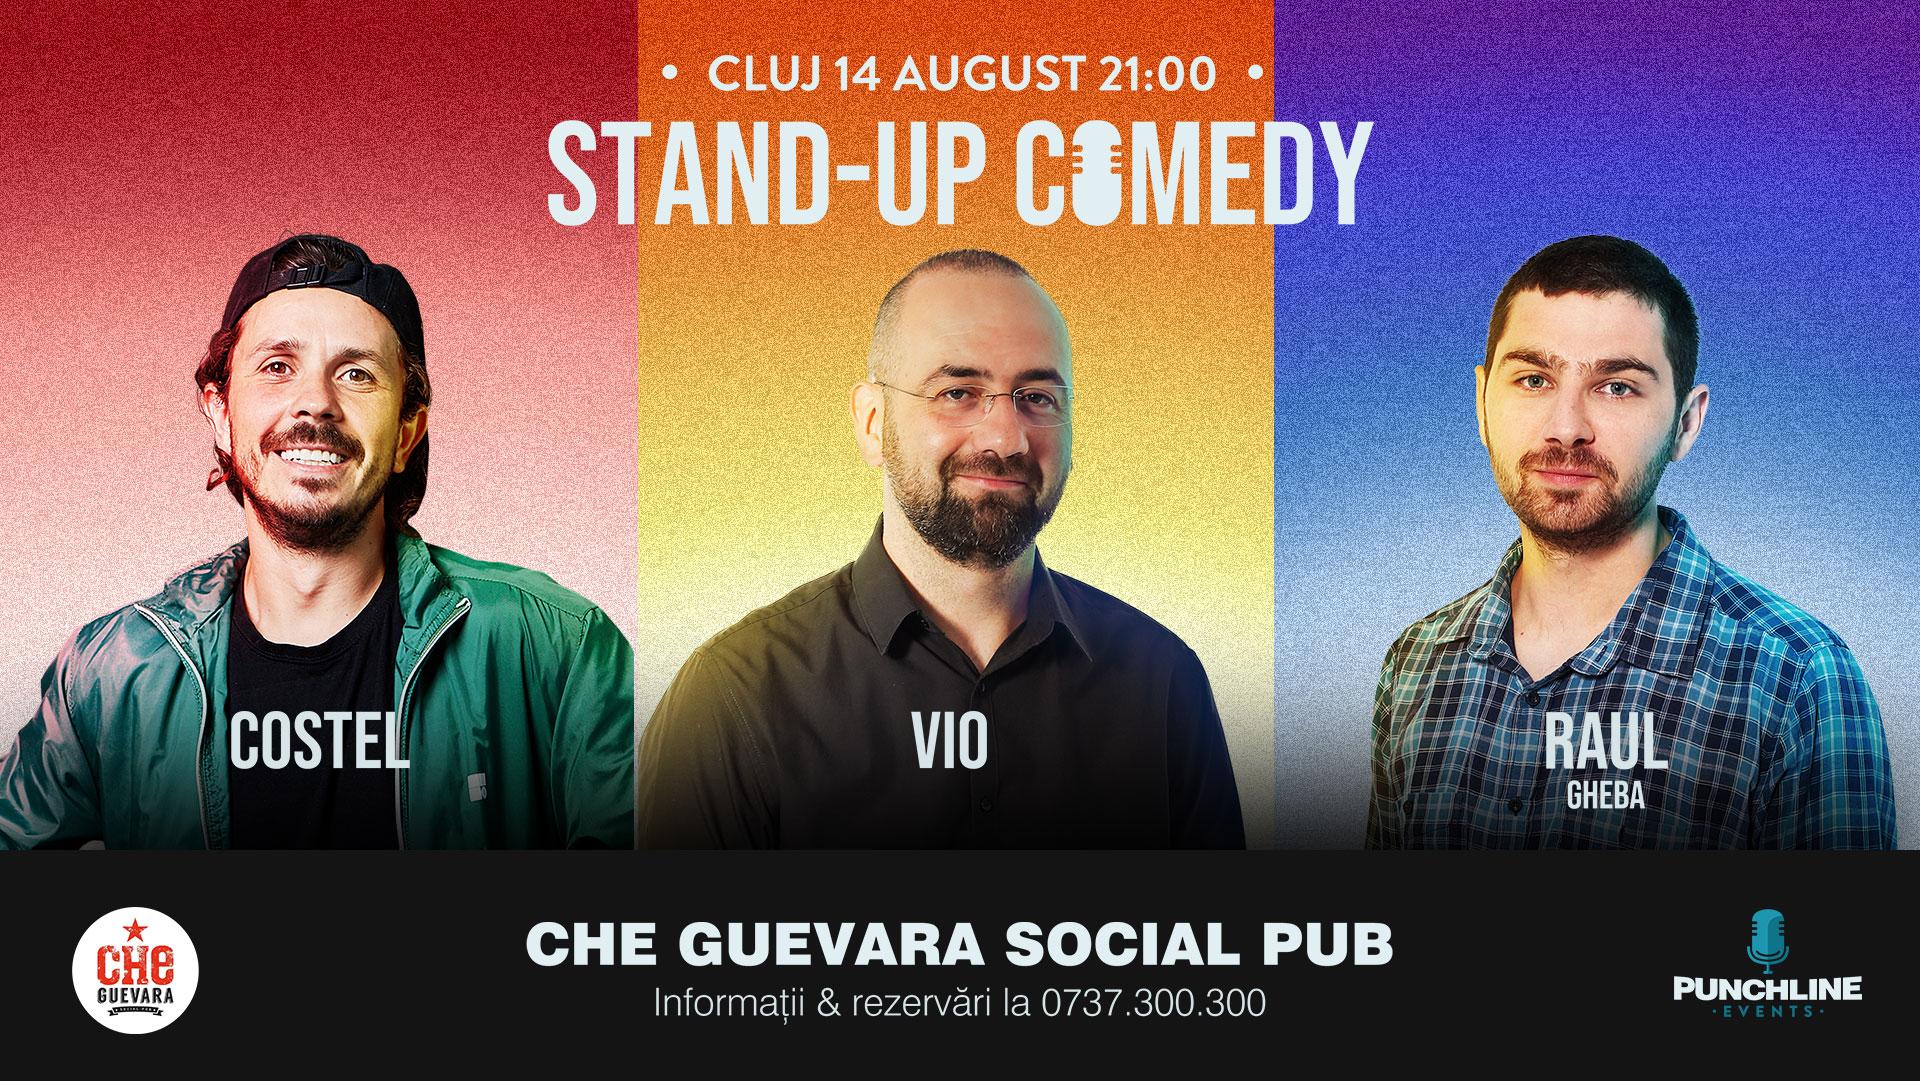 Stand Up Comedy cu Costel, Vio & Raul Gheba